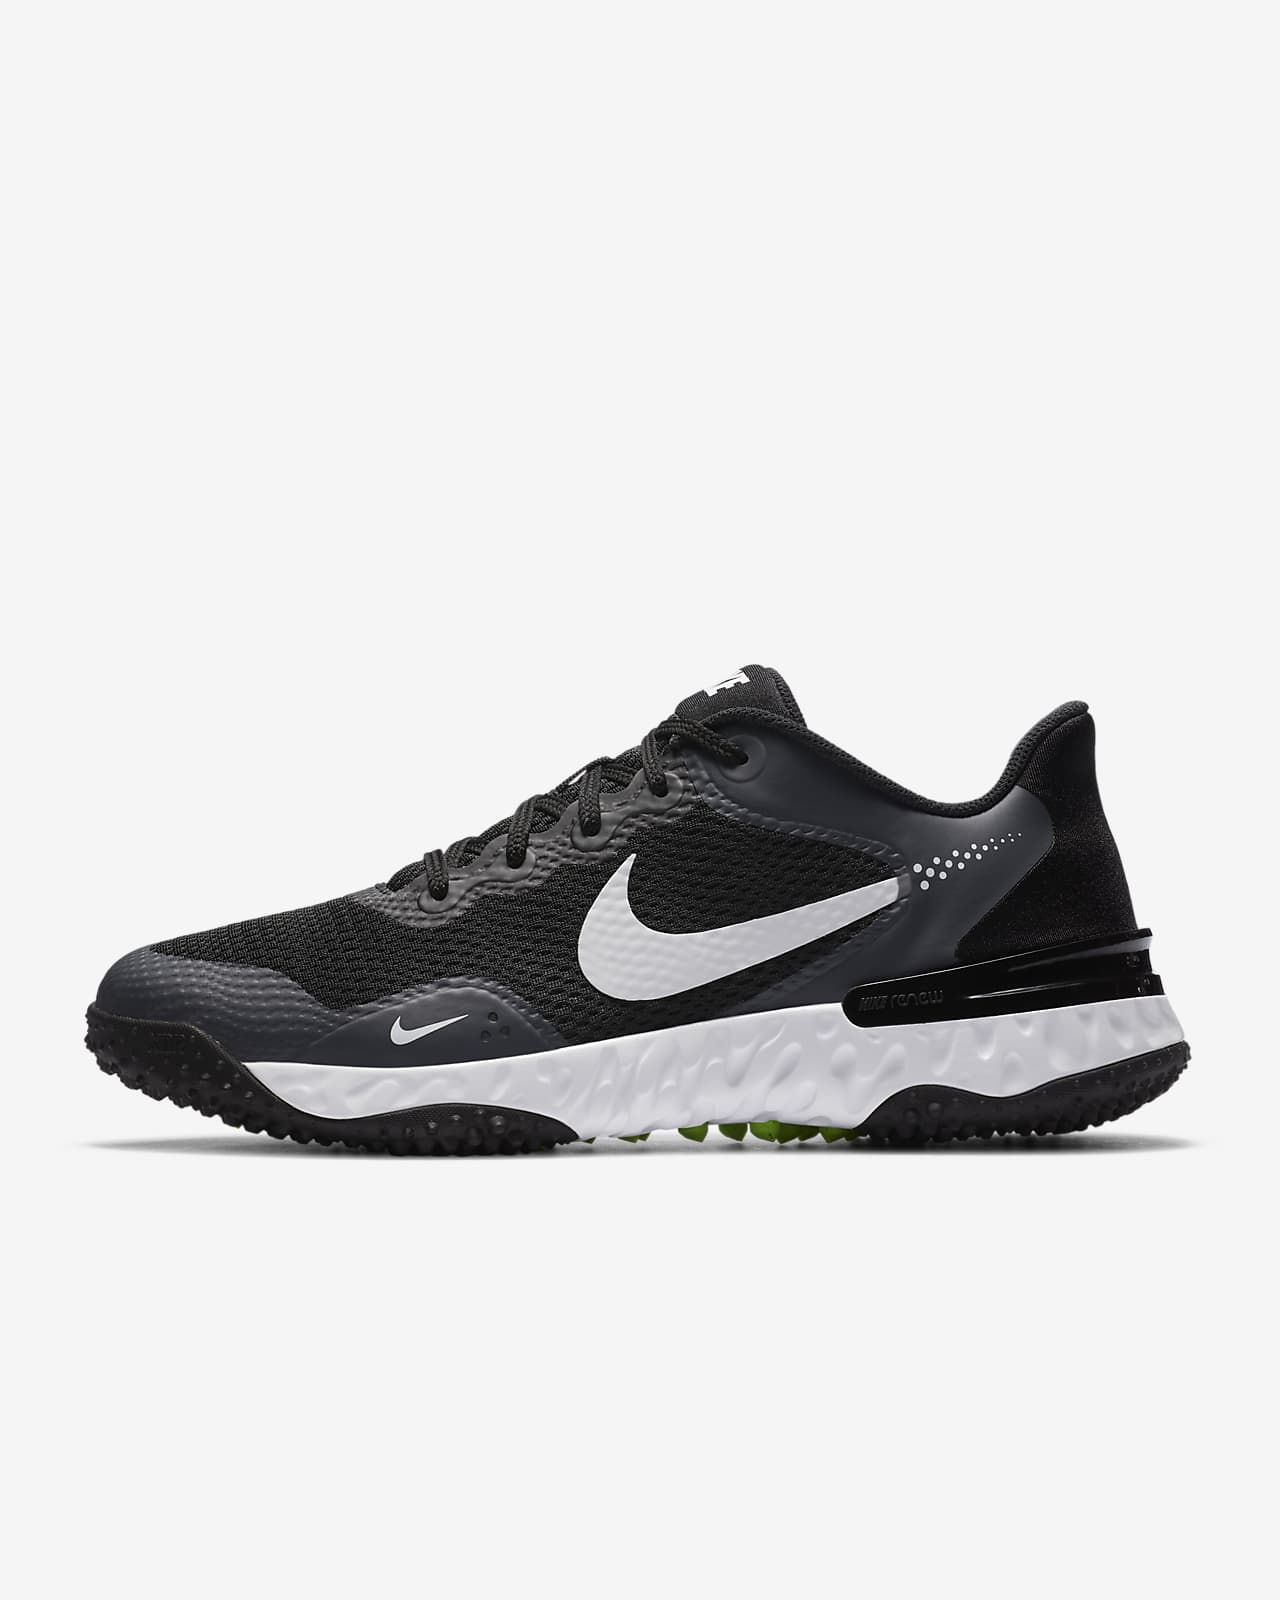 Calzado de béisbol Nike Alpha Huarache Elite 3 Turf